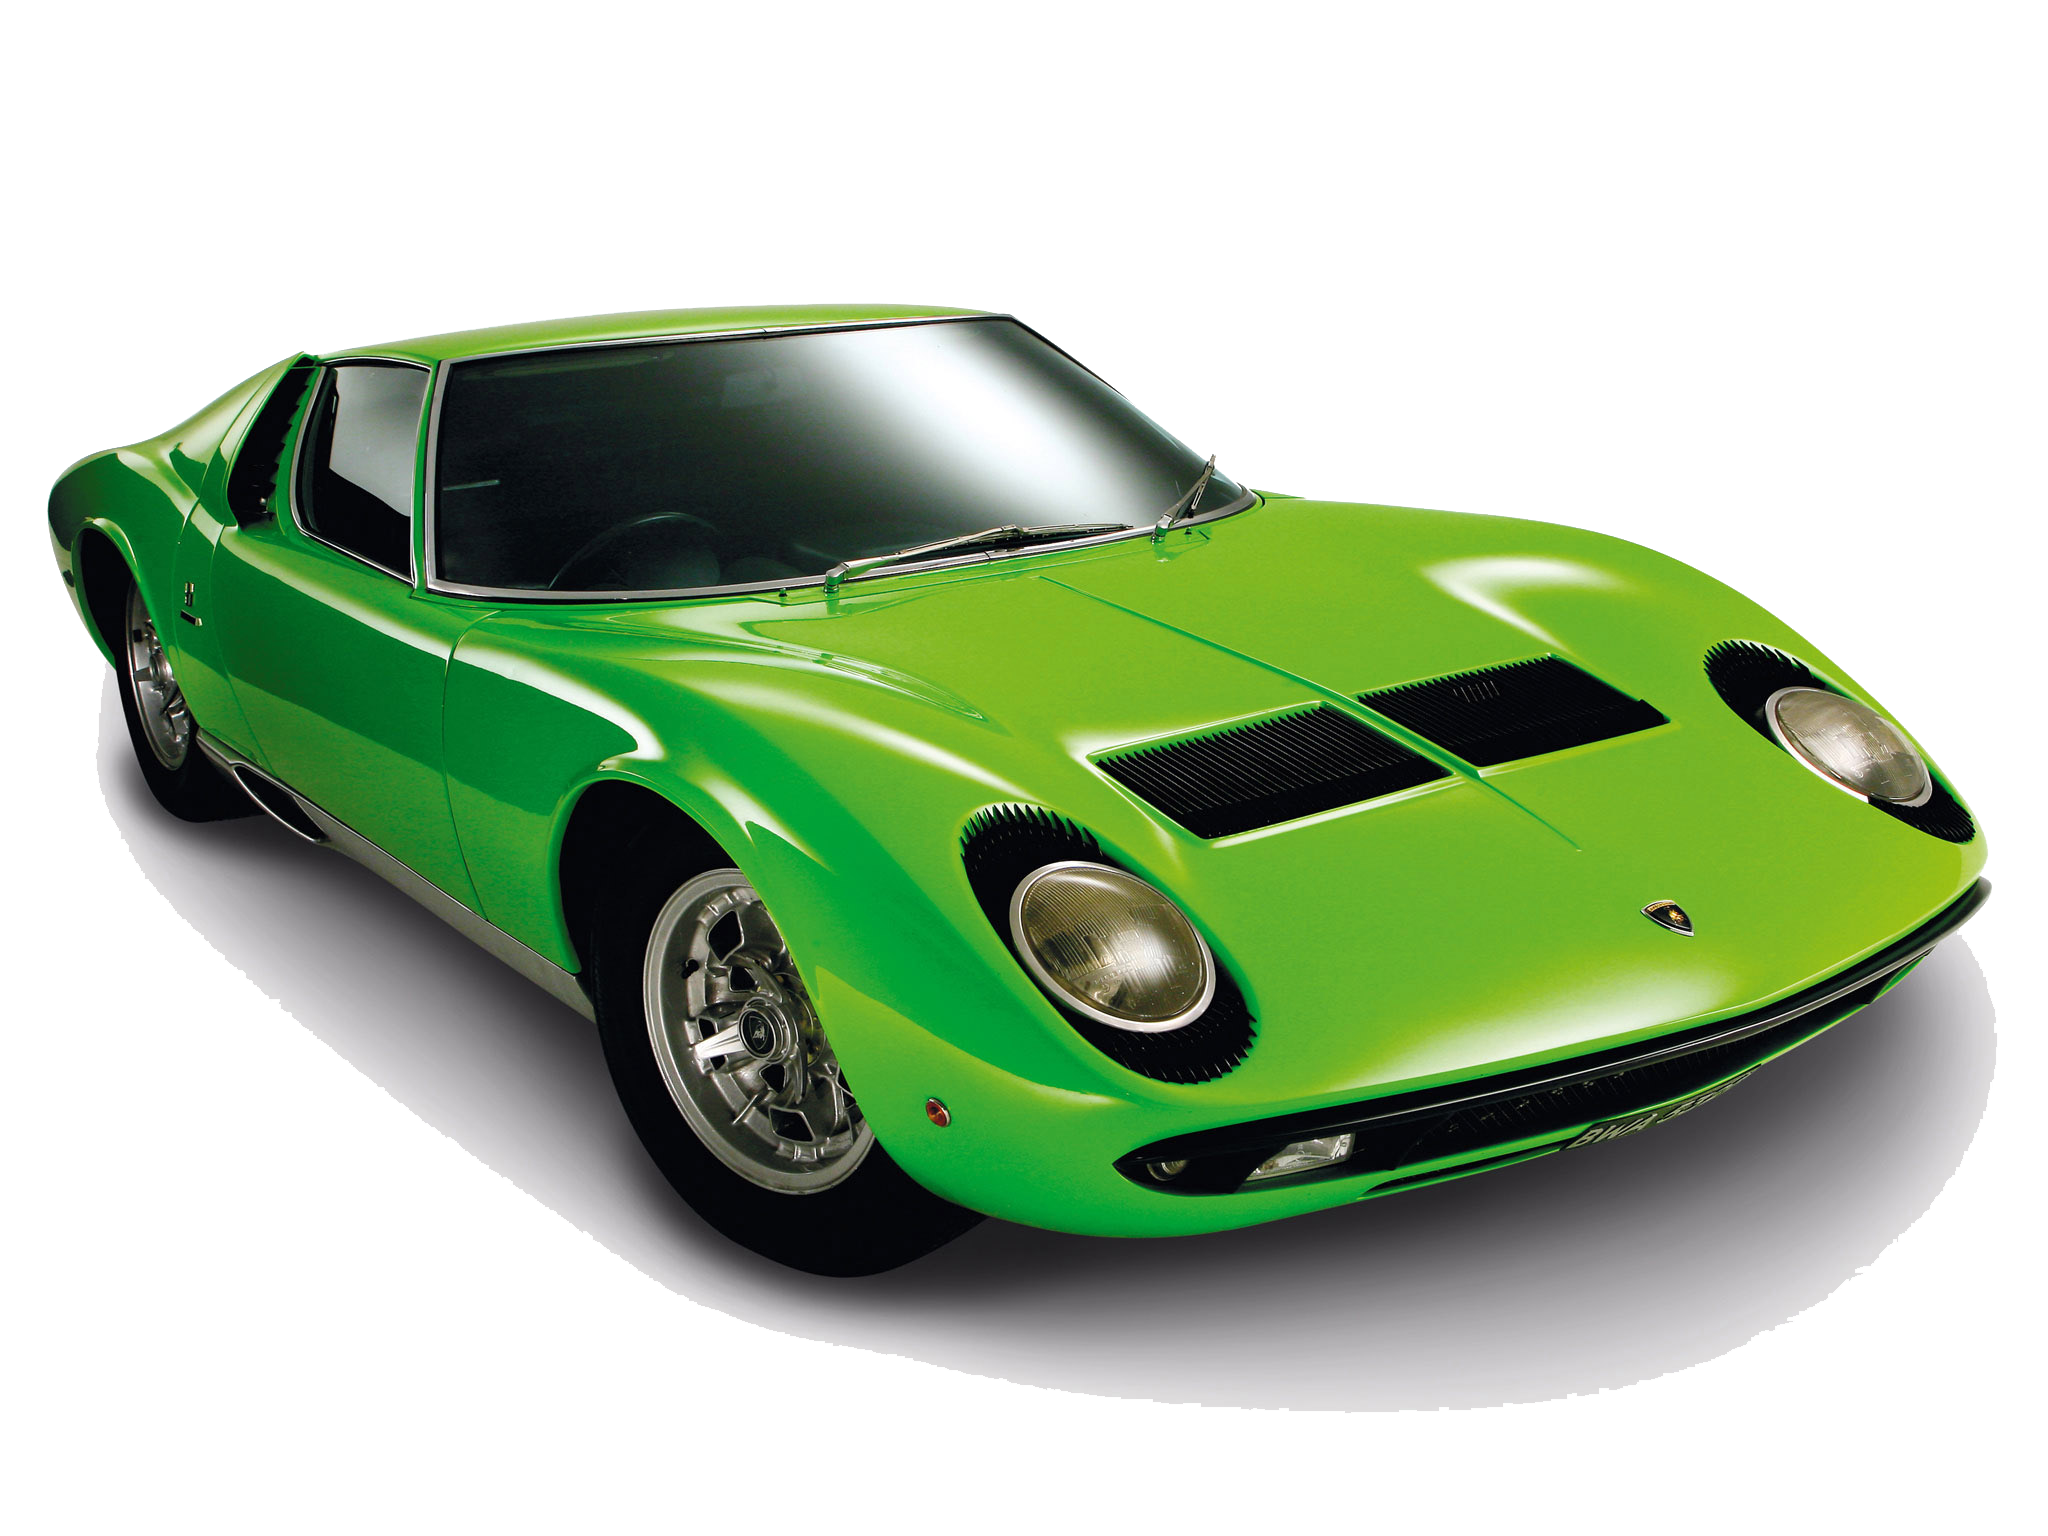 Lamborghini Png Hd PNG Image - Lamborghini HD PNG